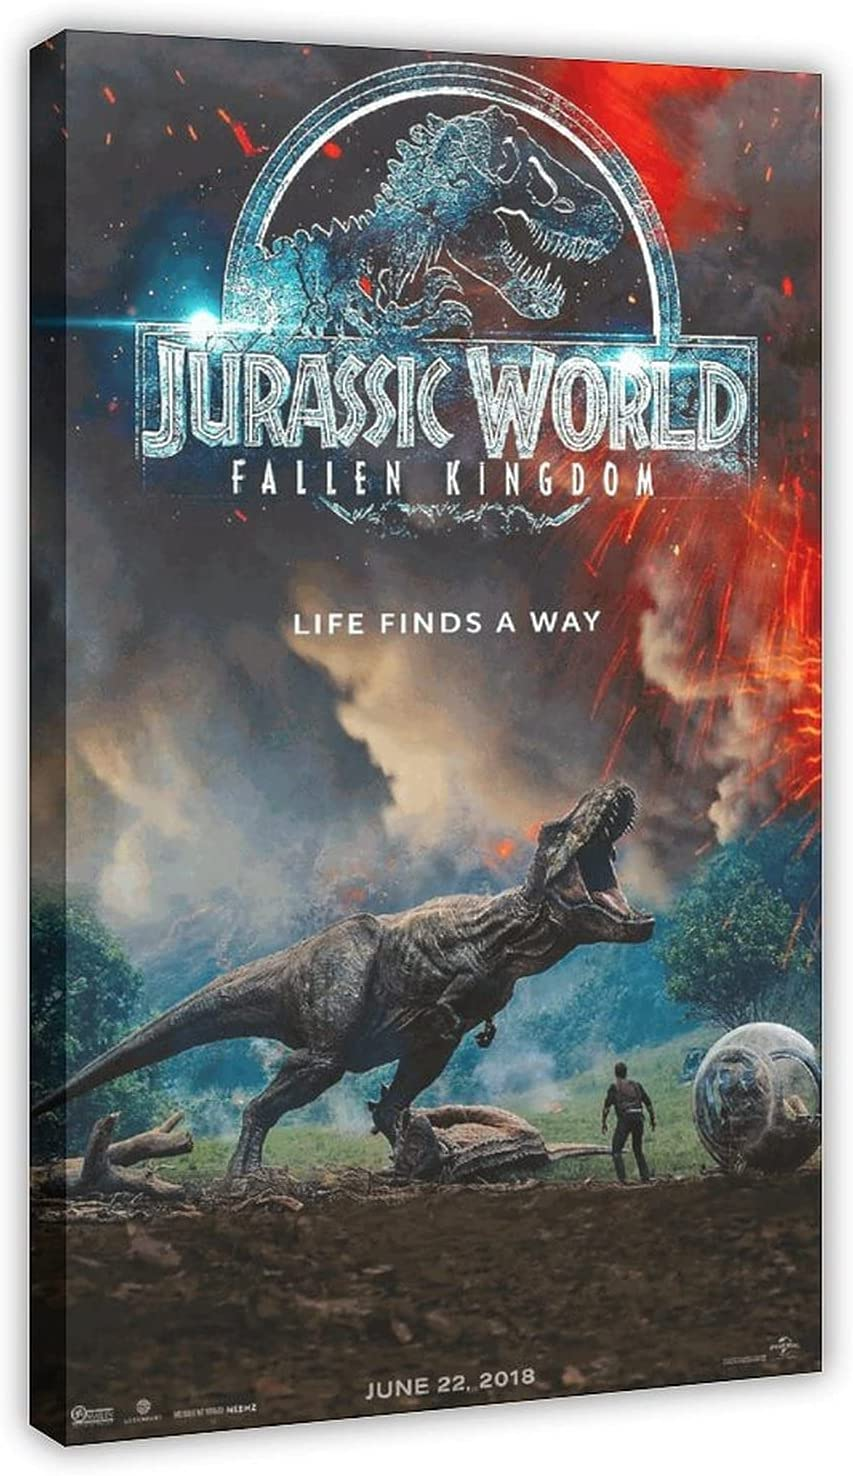 Jurassic Park latest Retro Movie Max 48% OFF Poster Wall Decor Art 23 Canvas